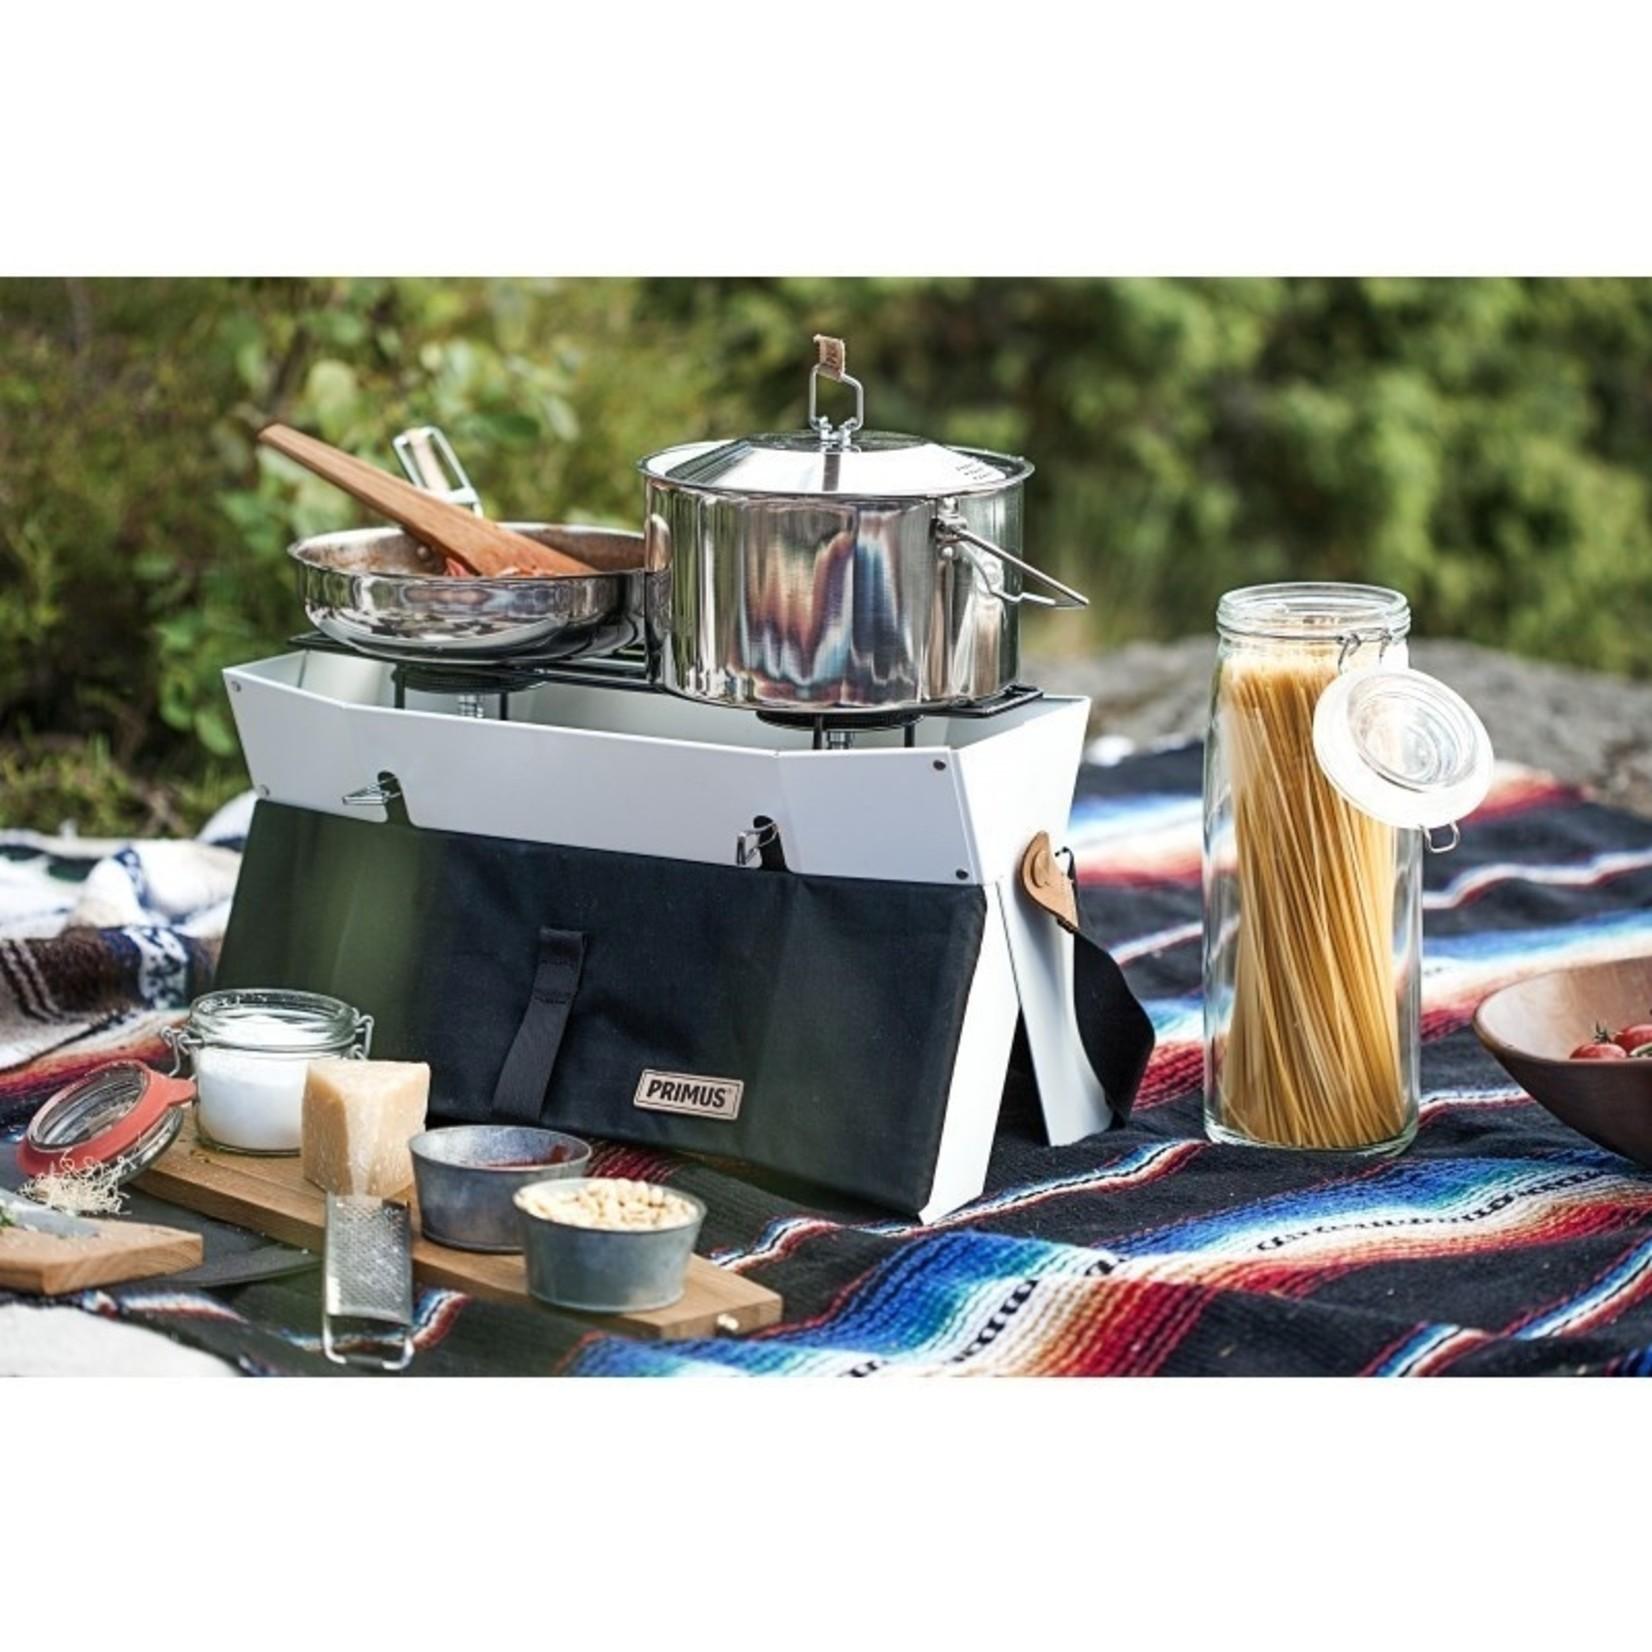 Primus Primus Campfire pannenset compact, BPA-vrij